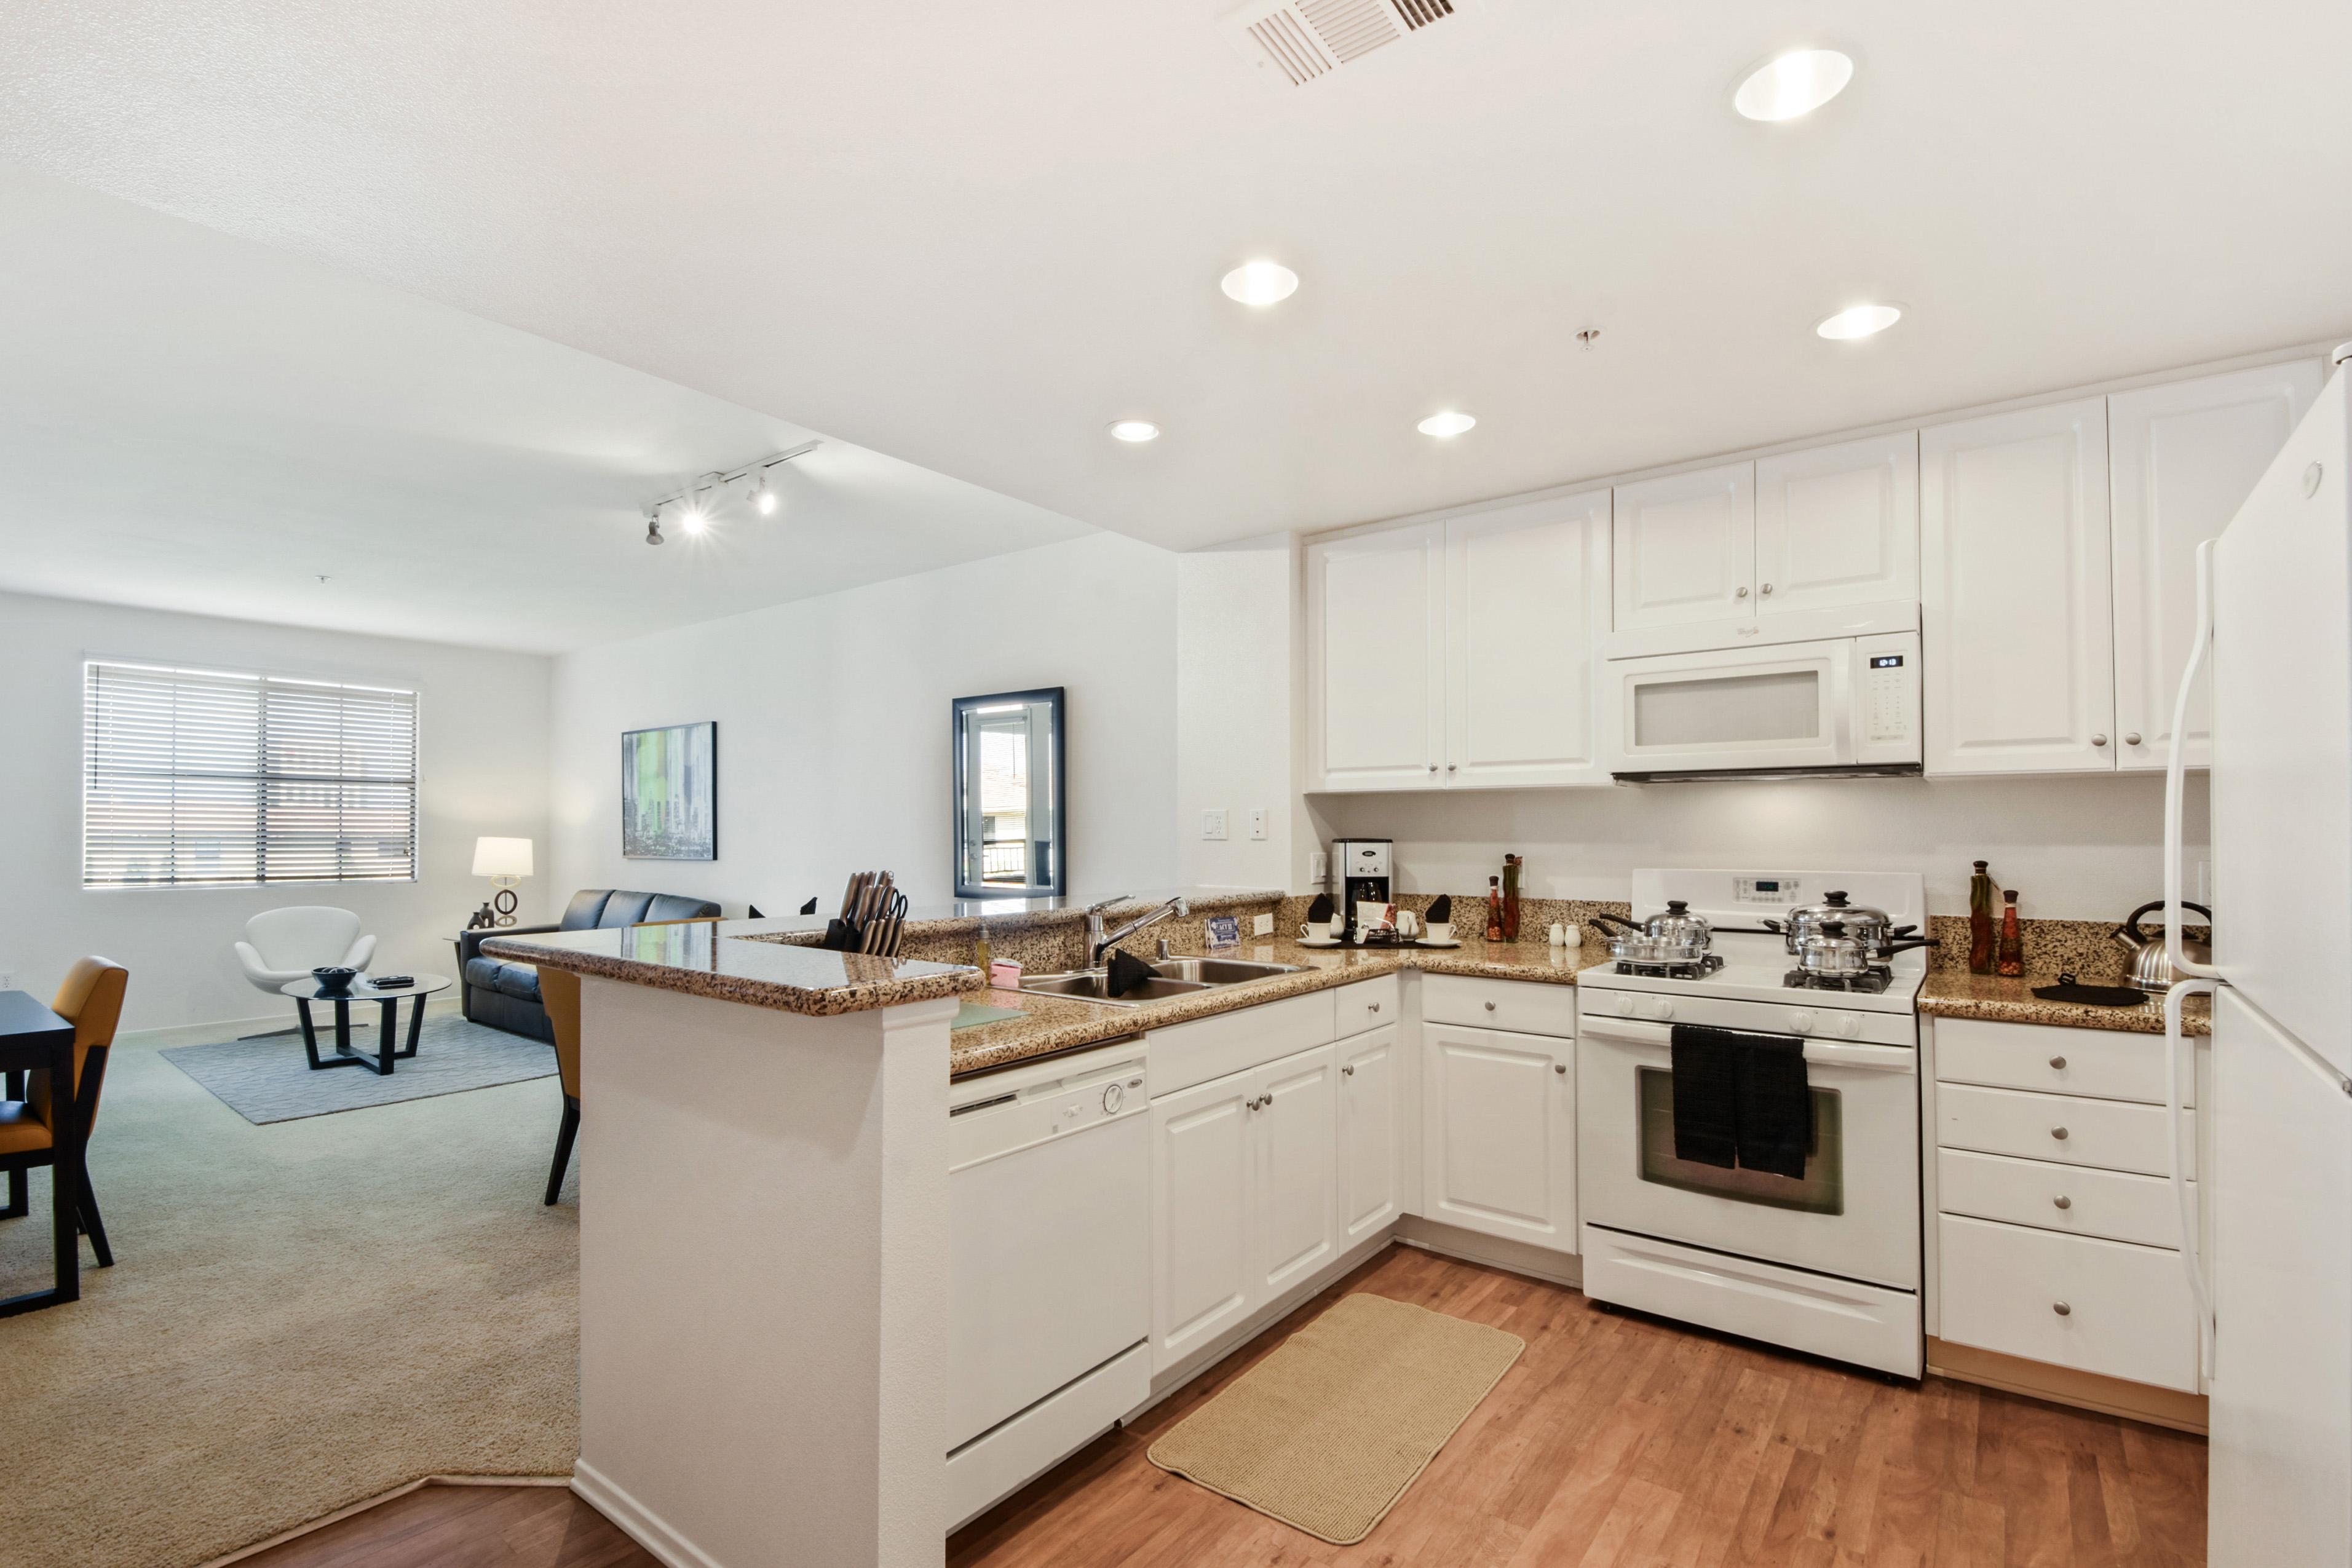 image 6 furnished 1 bedroom Apartment for rent in Irvine, Orange County